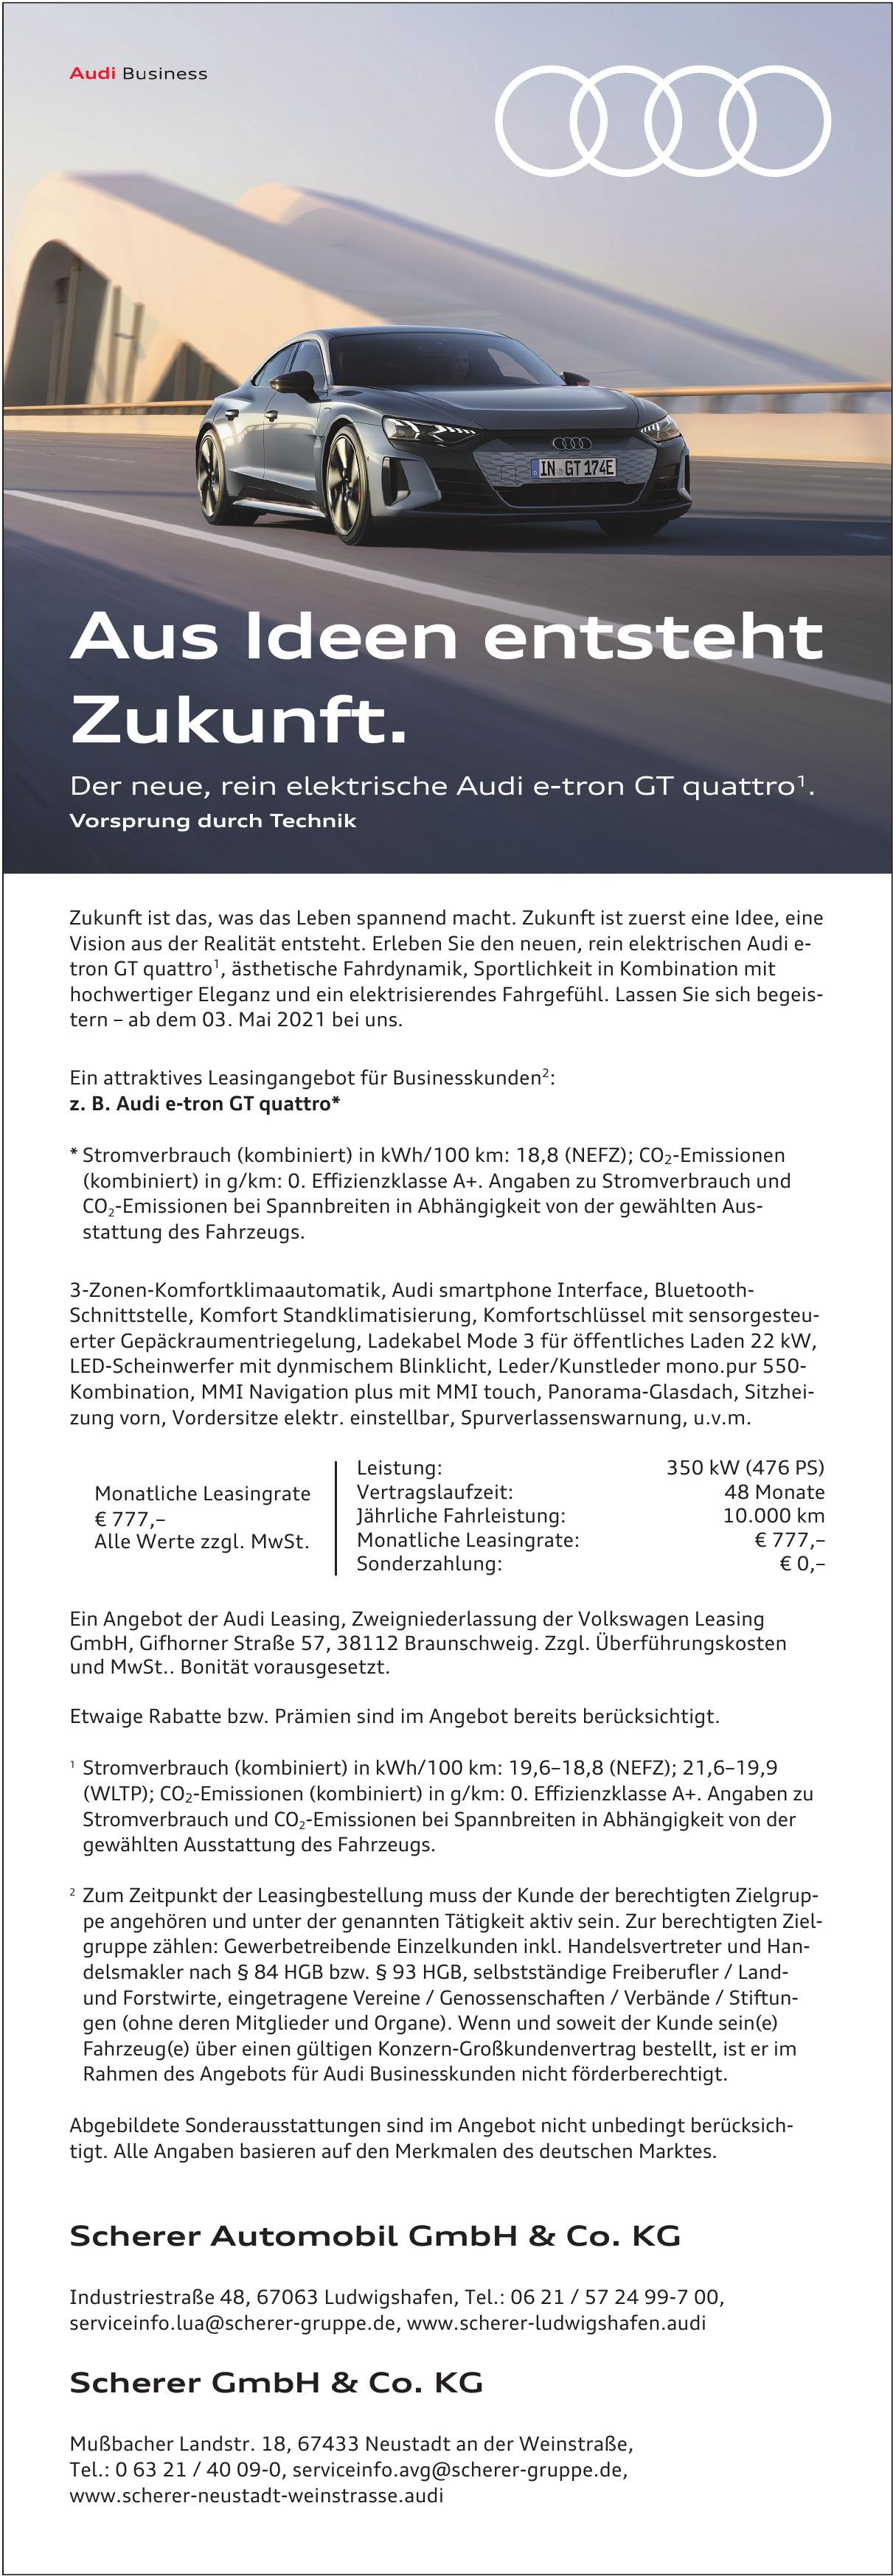 Scherer Automobil GmbH & Co. KG